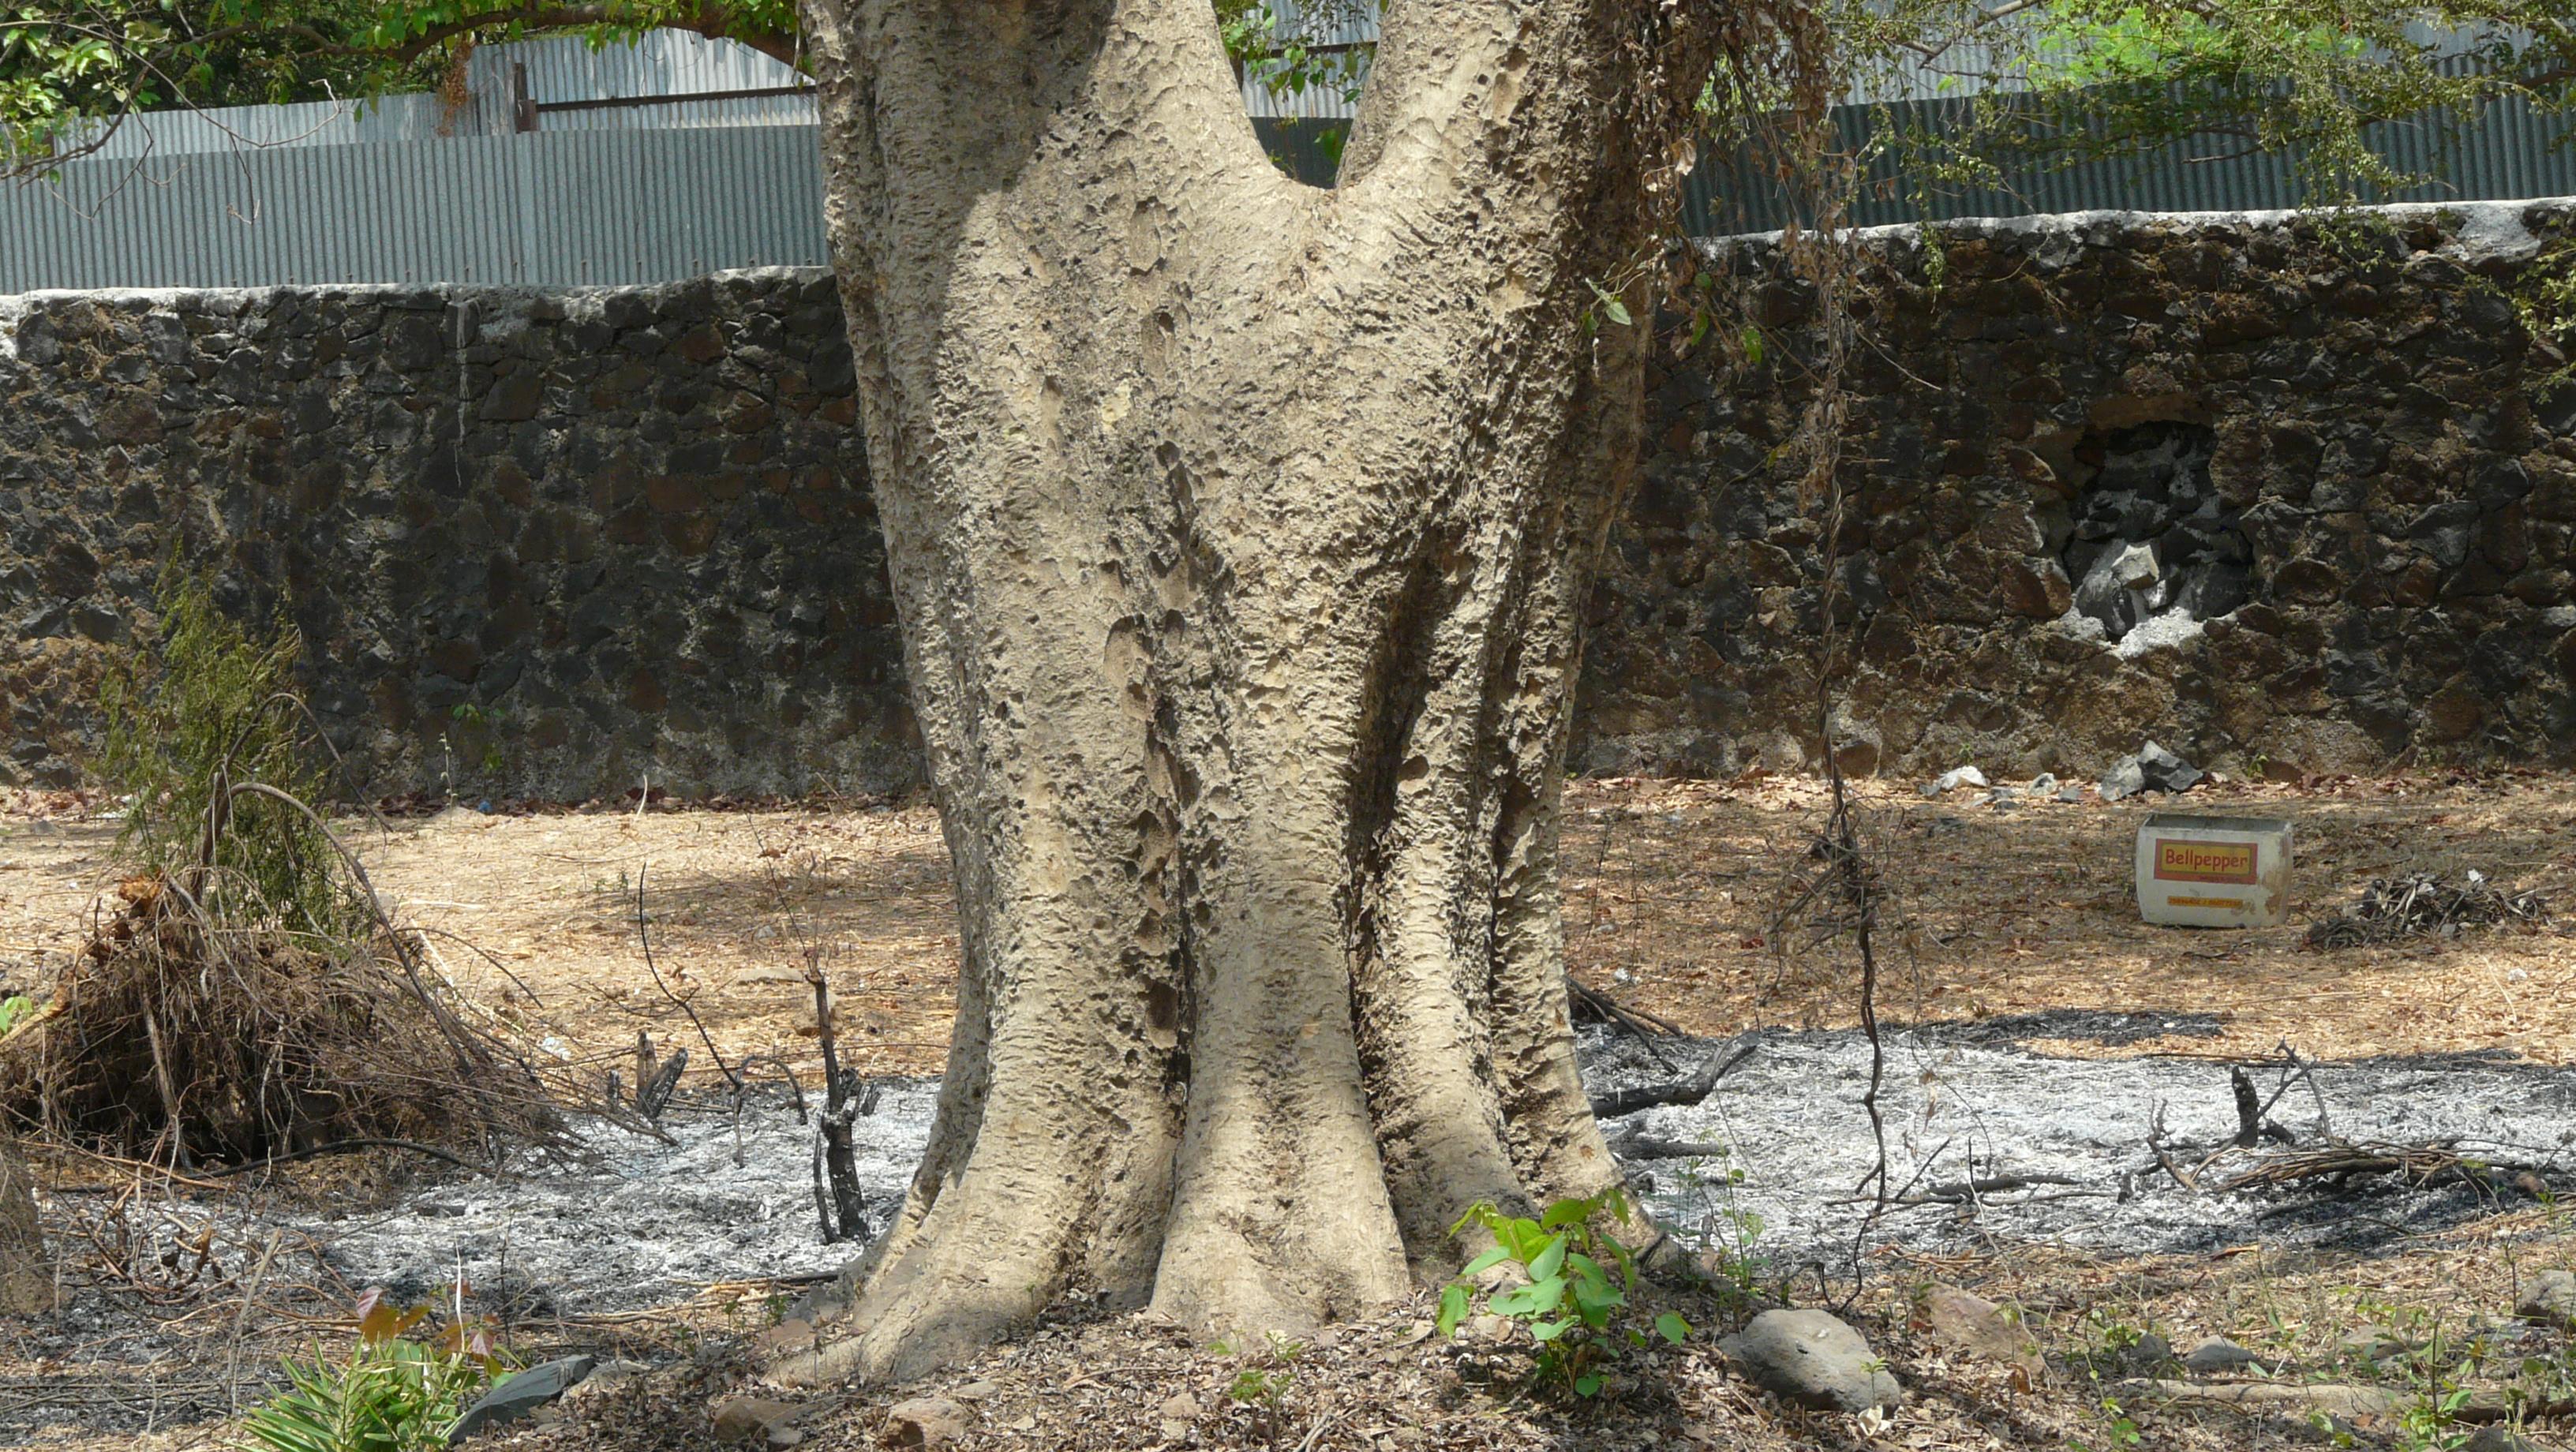 Rosewood tree in hindi. Rosewood tree Meaning in Hindi ...